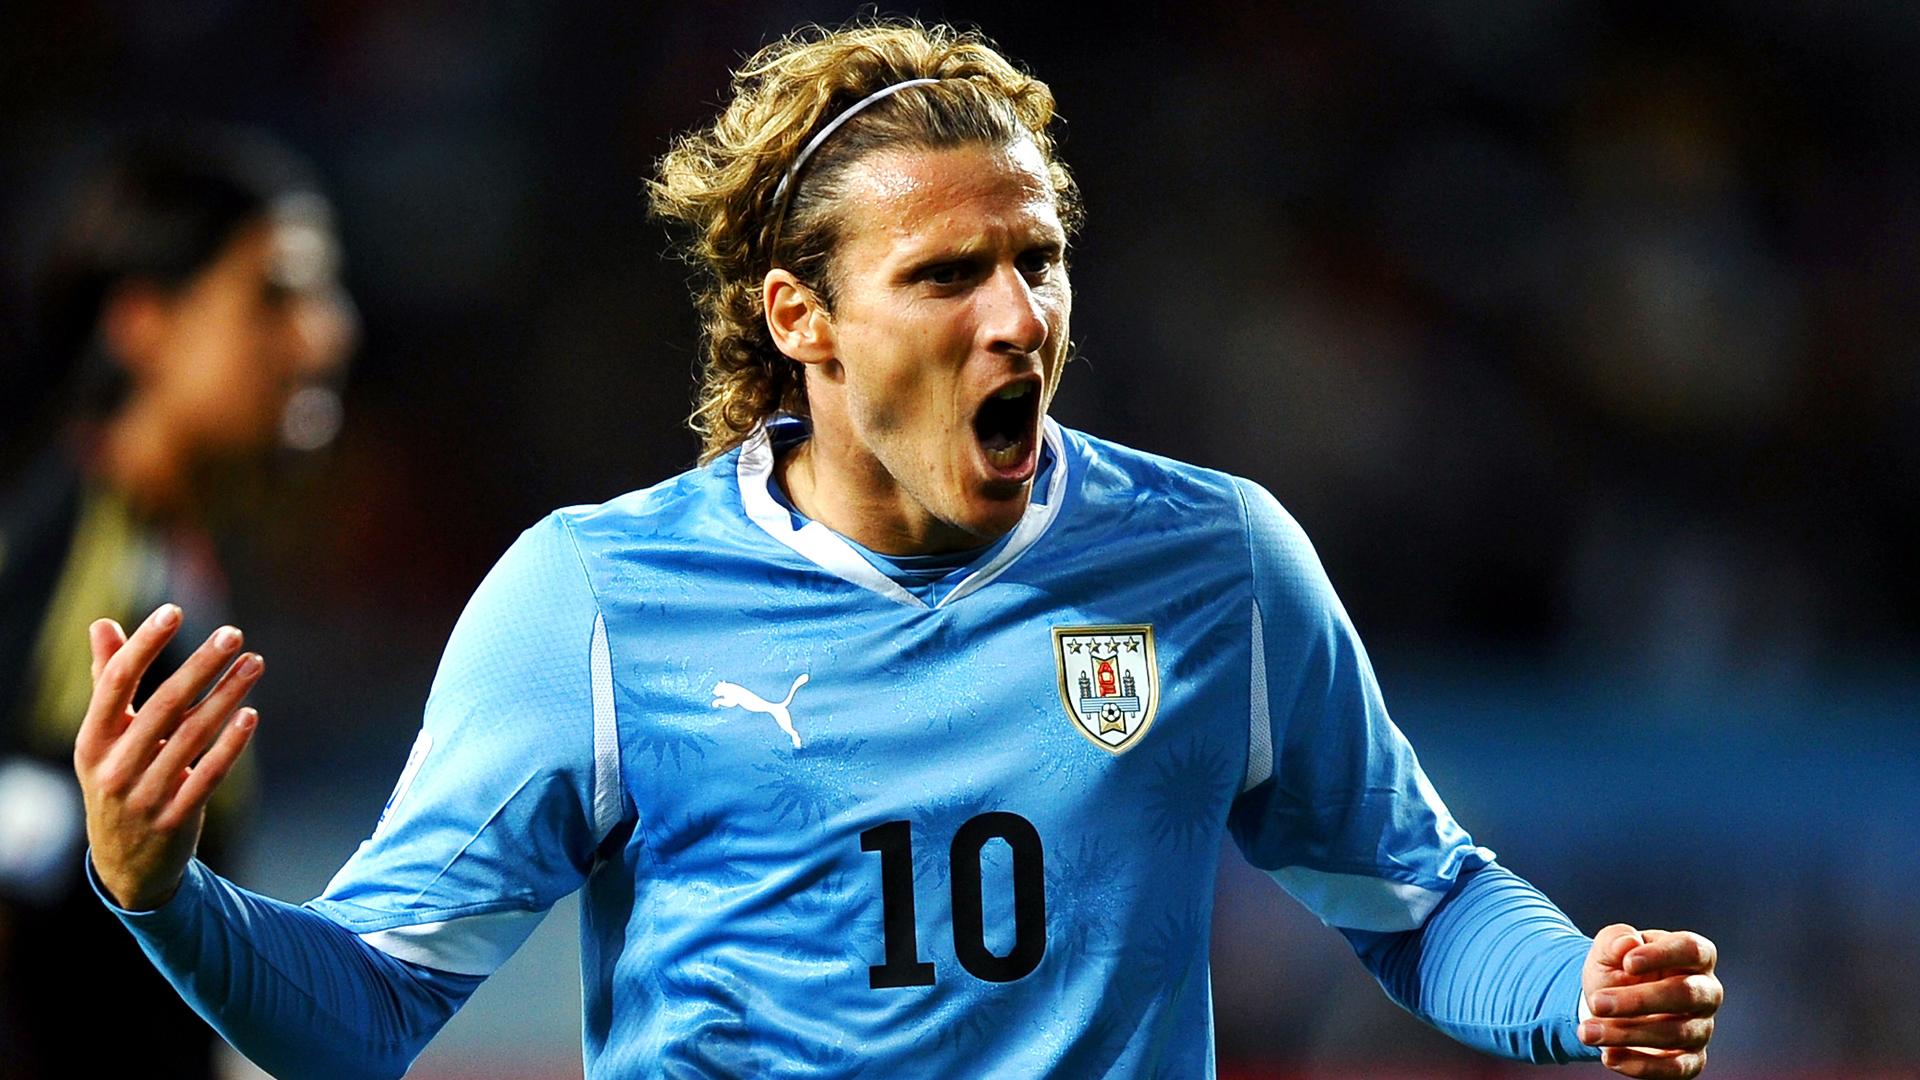 Diego Forlan Urugay World Cup 2010